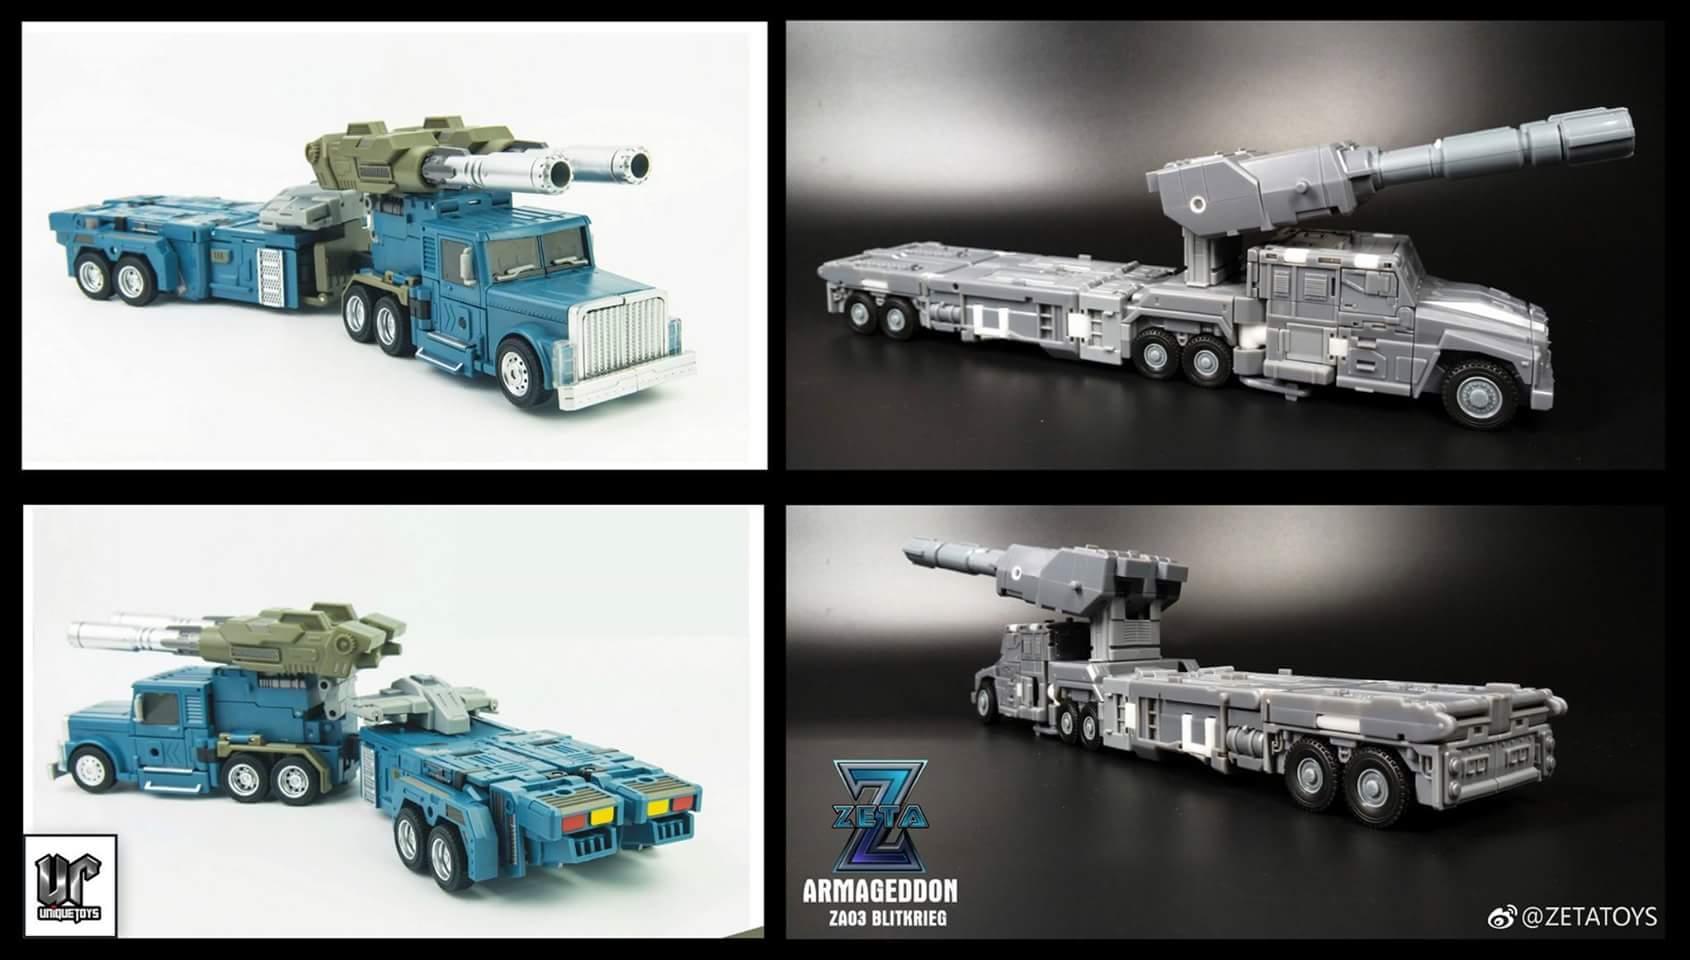 [Zeta Toys] Produit Tiers - Armageddon (ZA-01 à ZA-05) - ZA-06 Bruticon - ZA-07 Bruticon ― aka Bruticus (Studio OX, couleurs G1, métallique) - Page 4 LdLmc4ZW_o